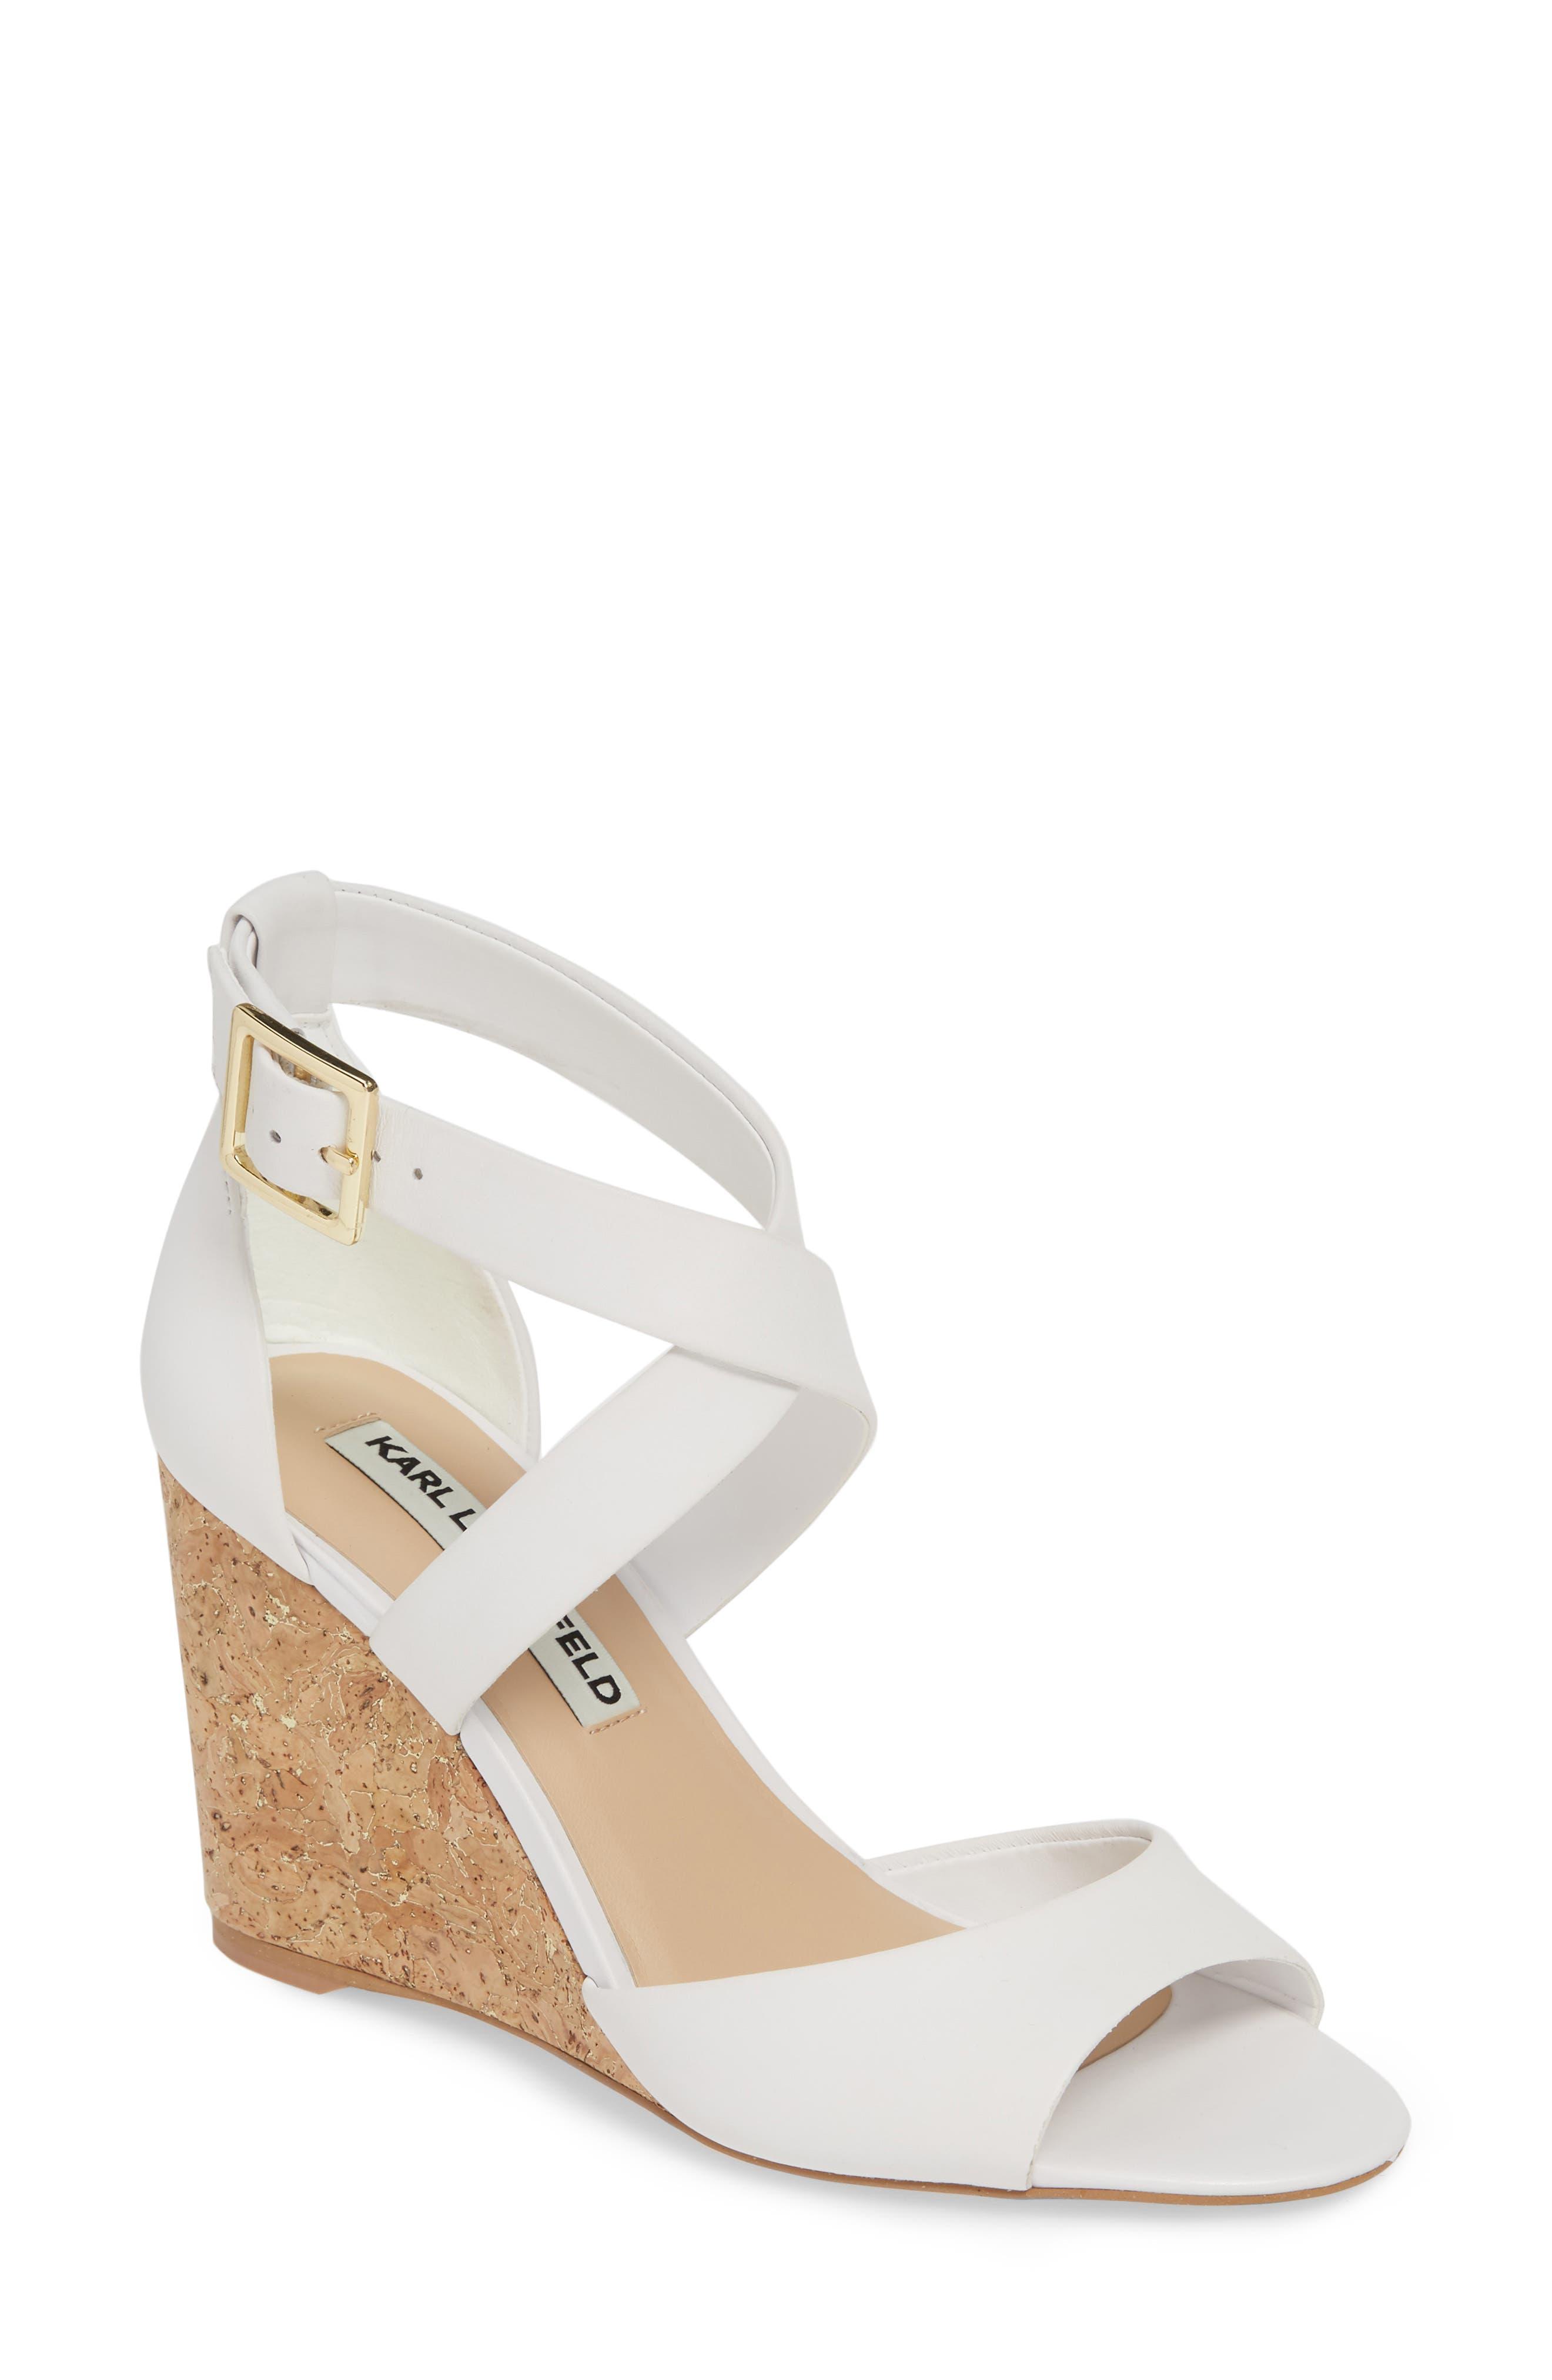 Karl Lagerfeld Paris Radka Wedge Sandal- White